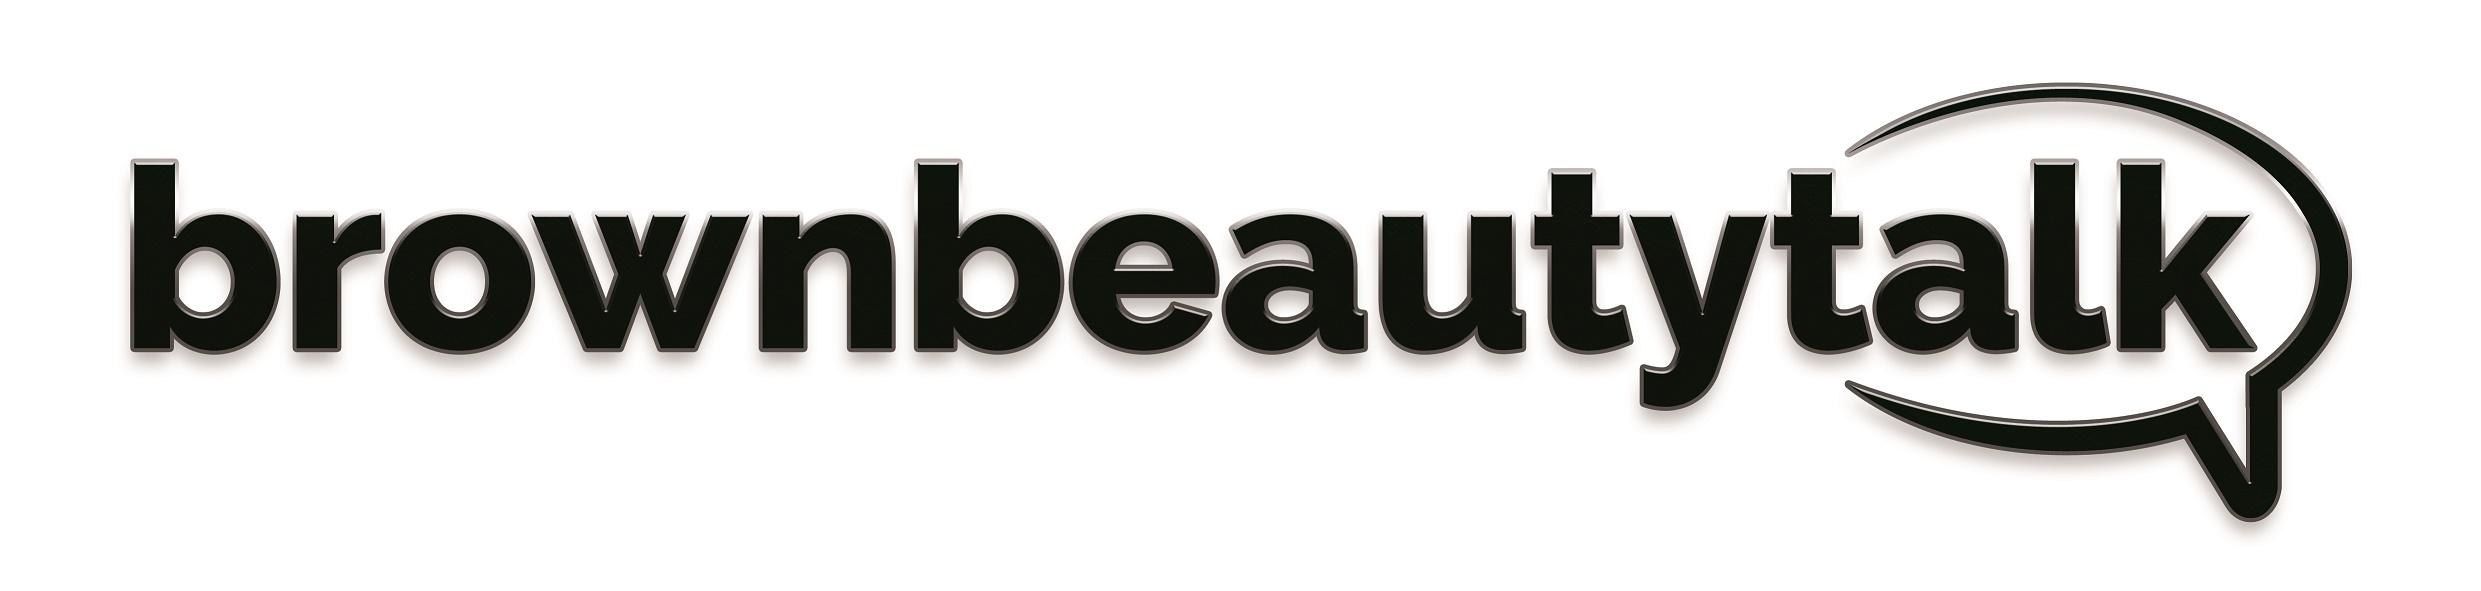 brownbeautytalklogo